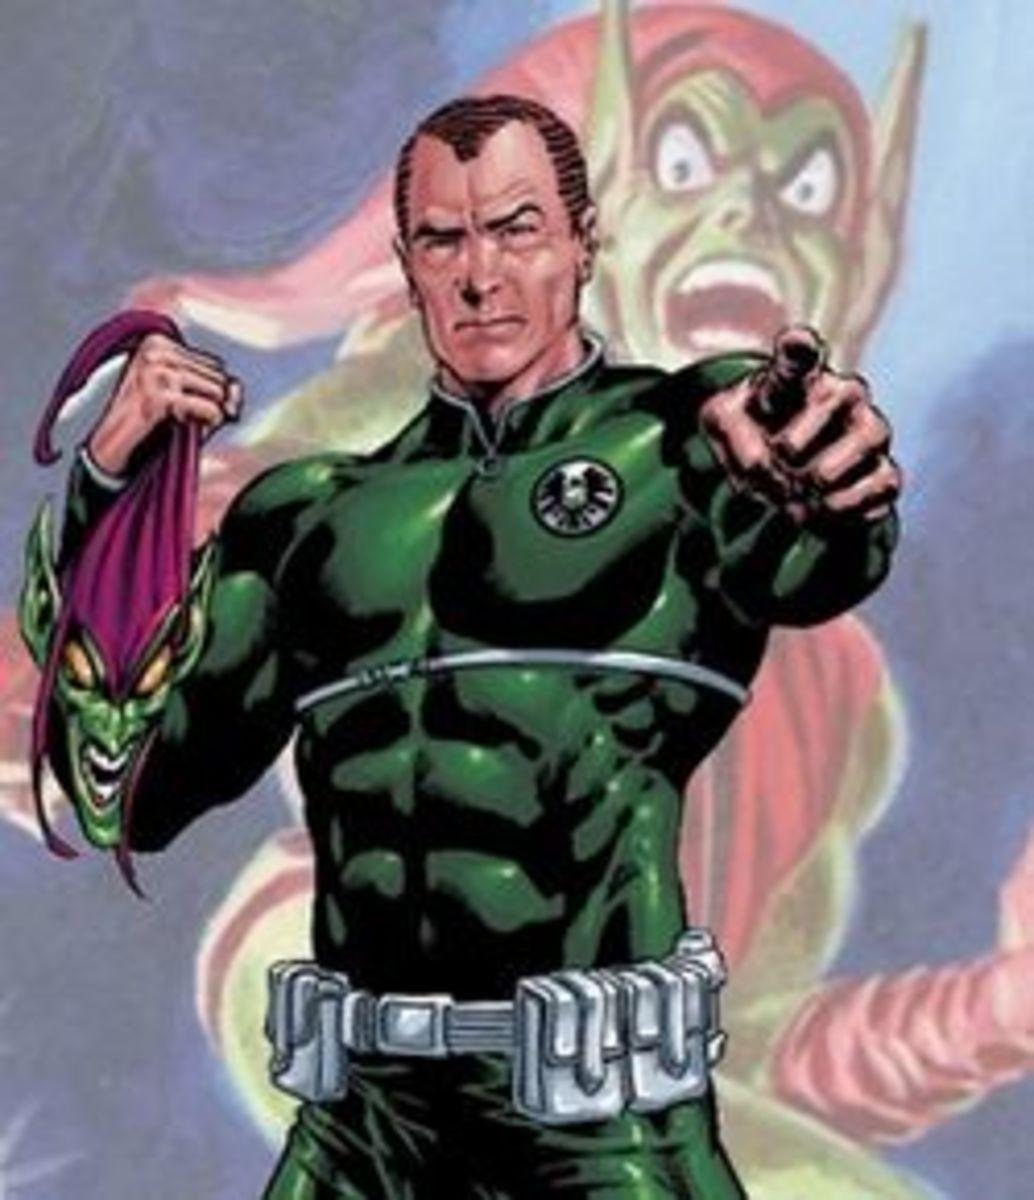 Norman Osborn, aka The Green Goblin and Former Head of Hammer